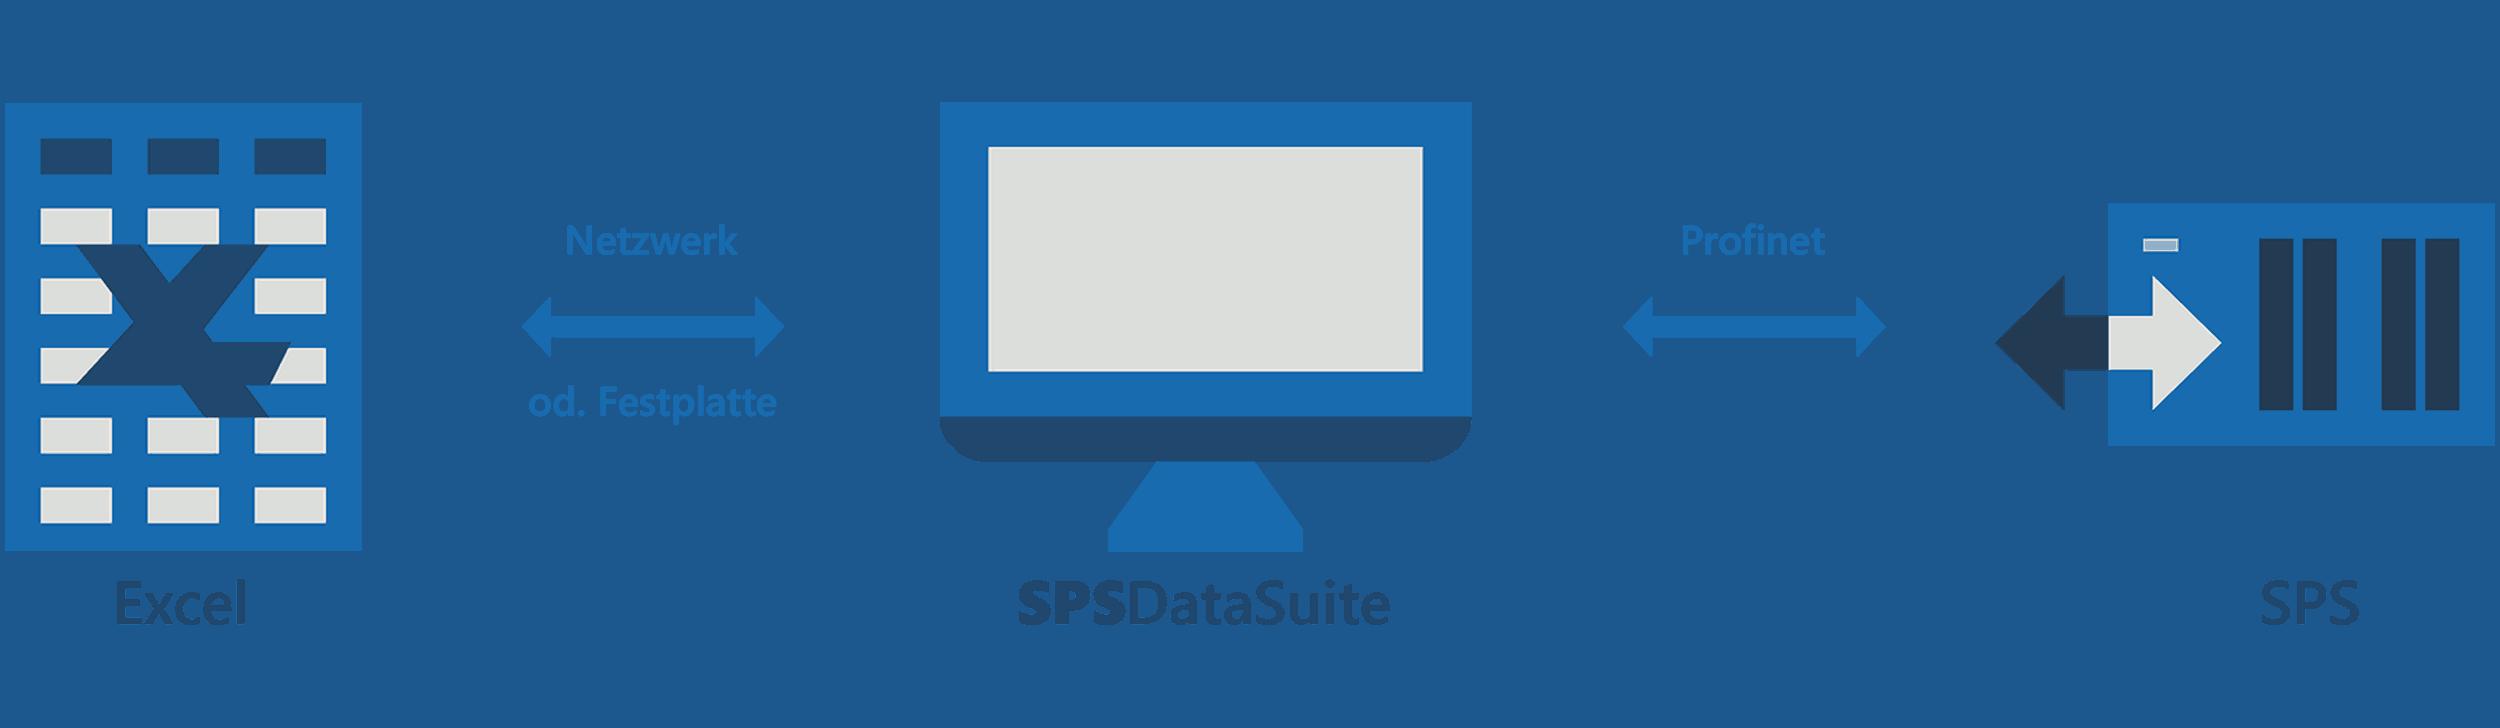 Excel-SPS Kopplung